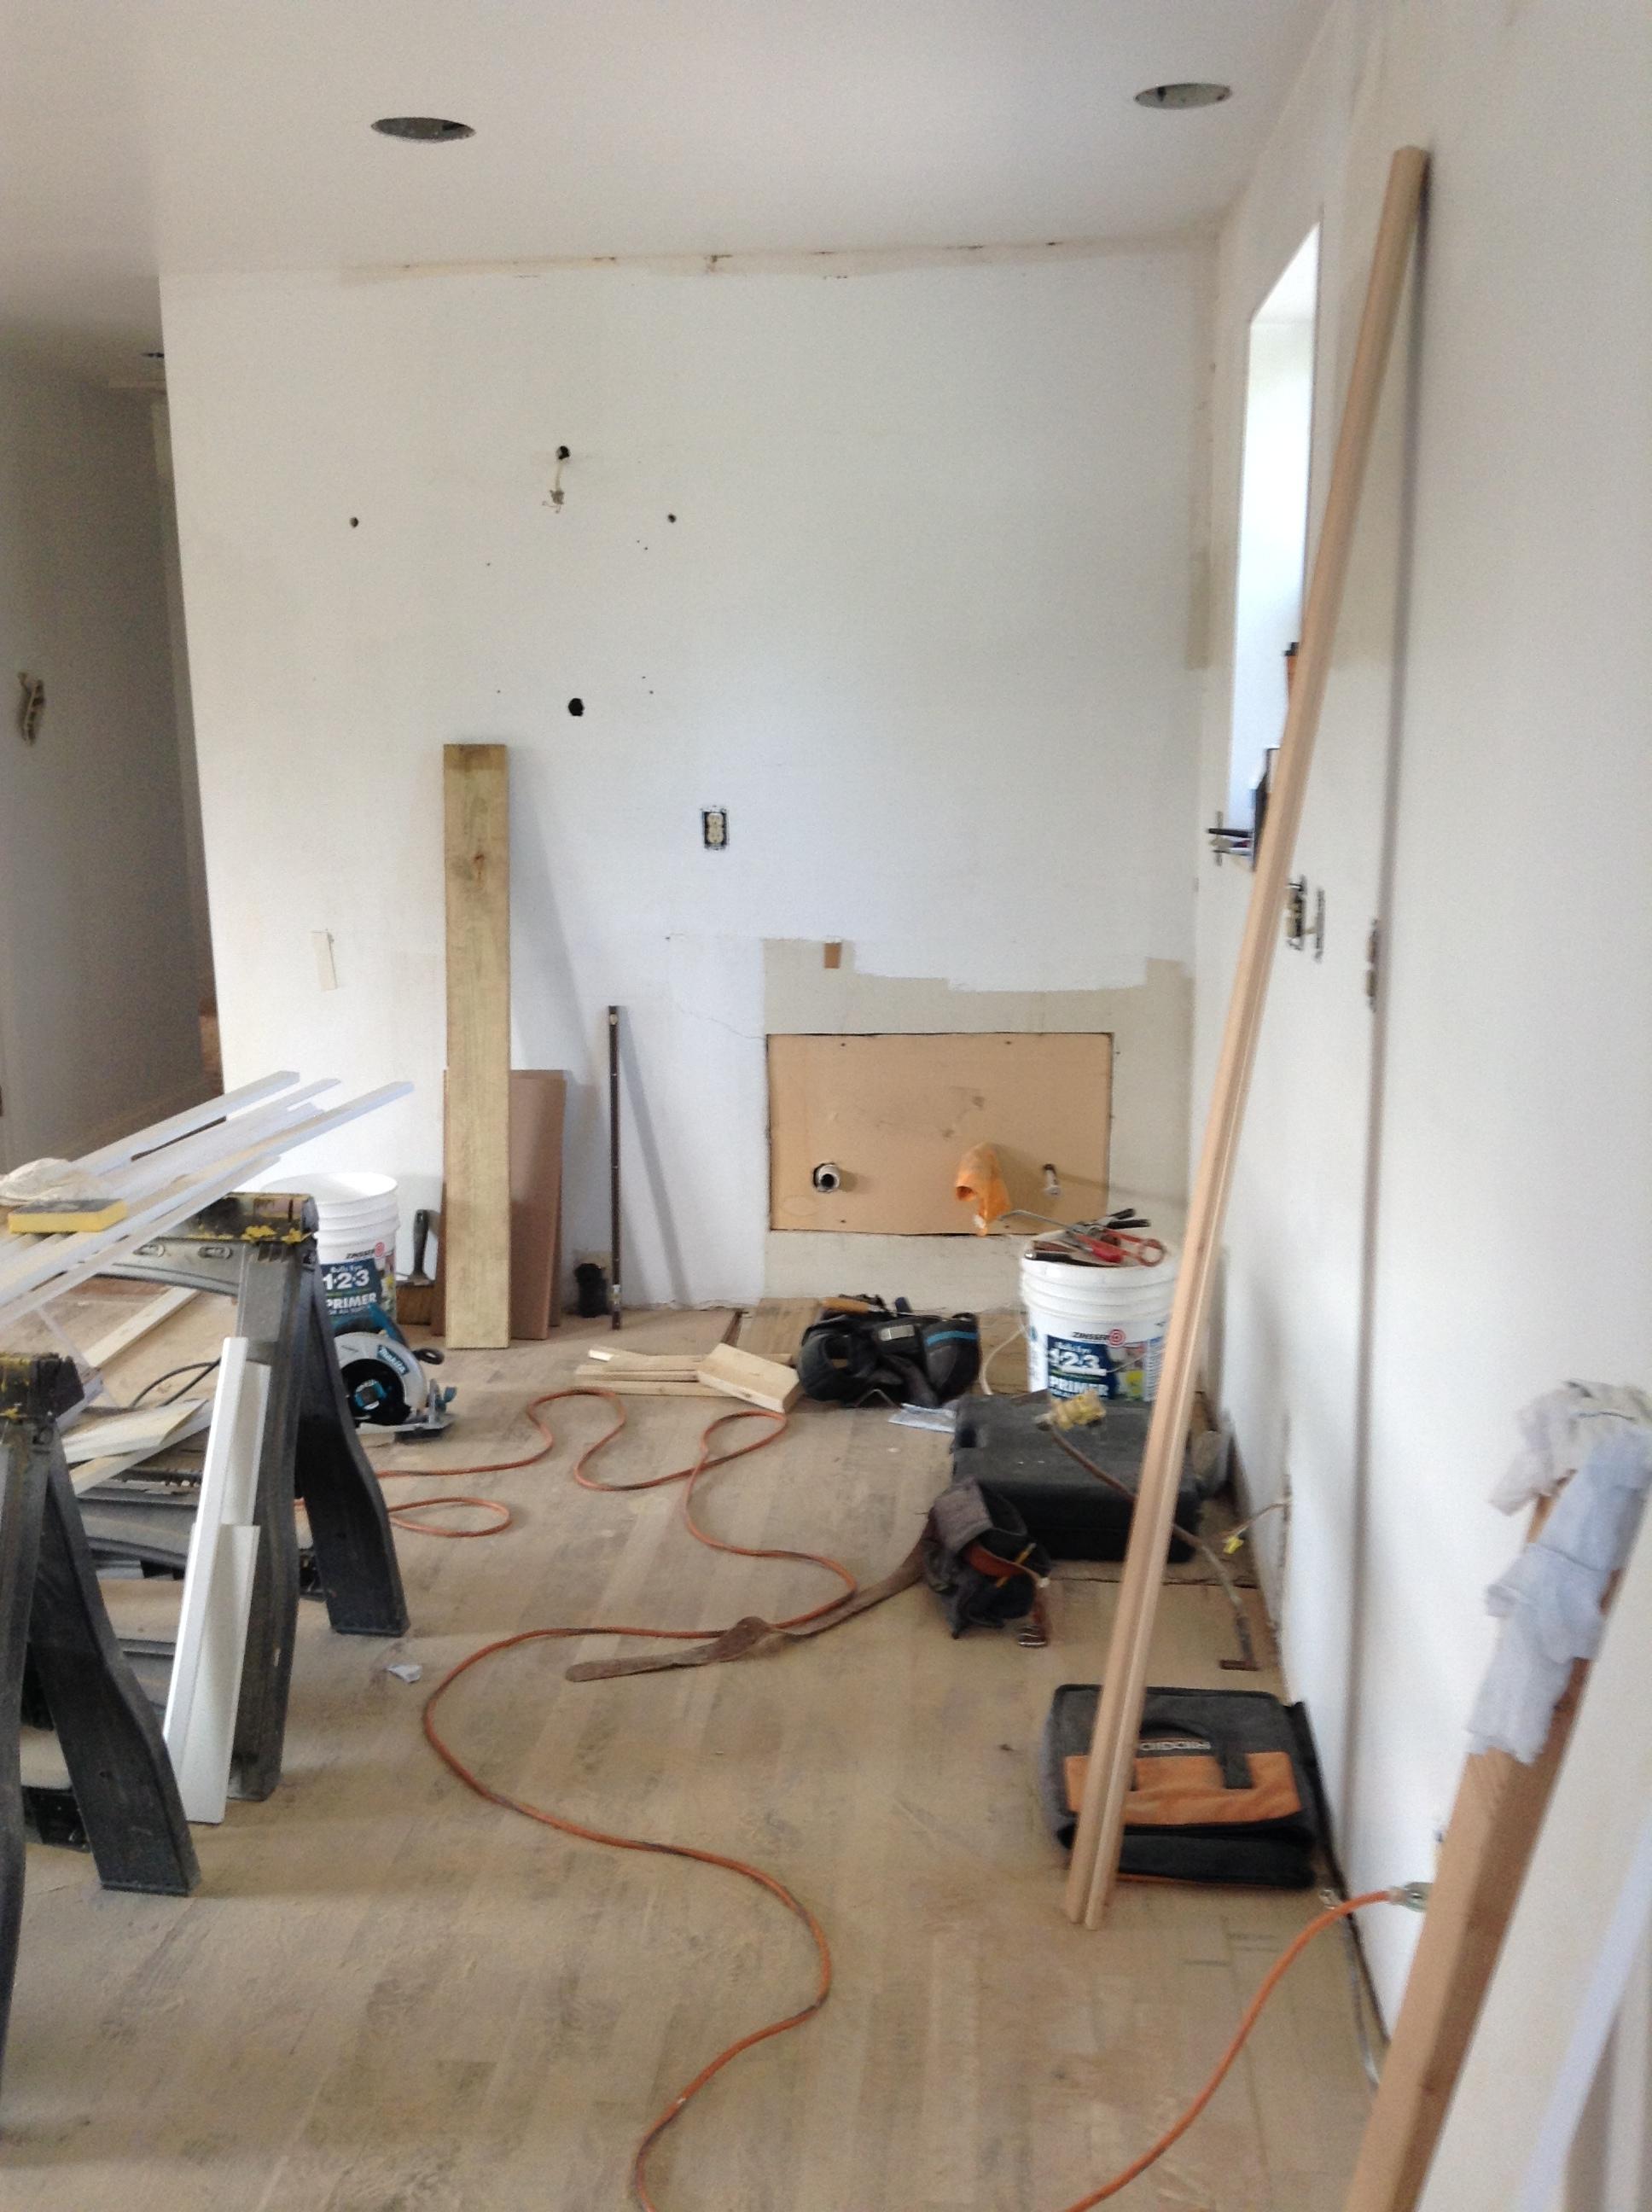 Kitchen Angle1-2a.jpg